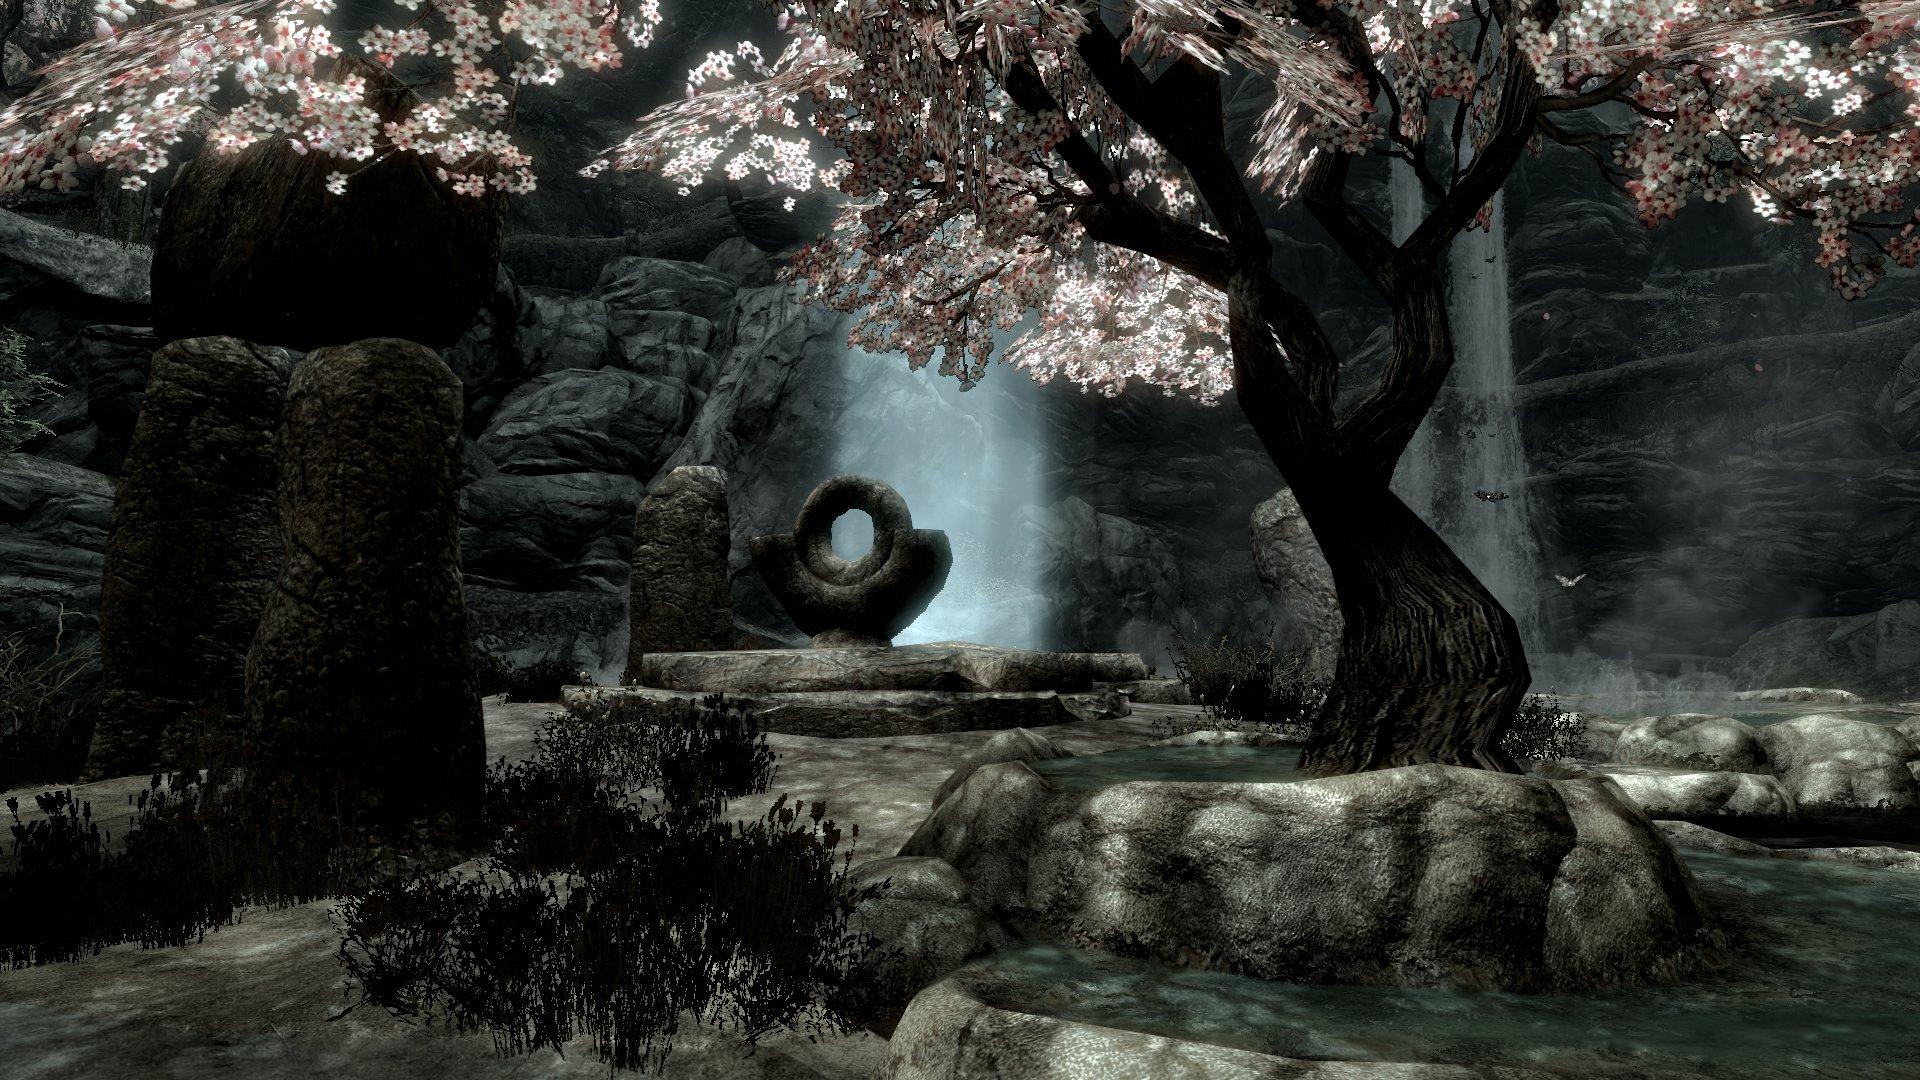 Elder Scrolls V Skyrim Beautiful Peace Tree Water wallpaper background 1920x1080